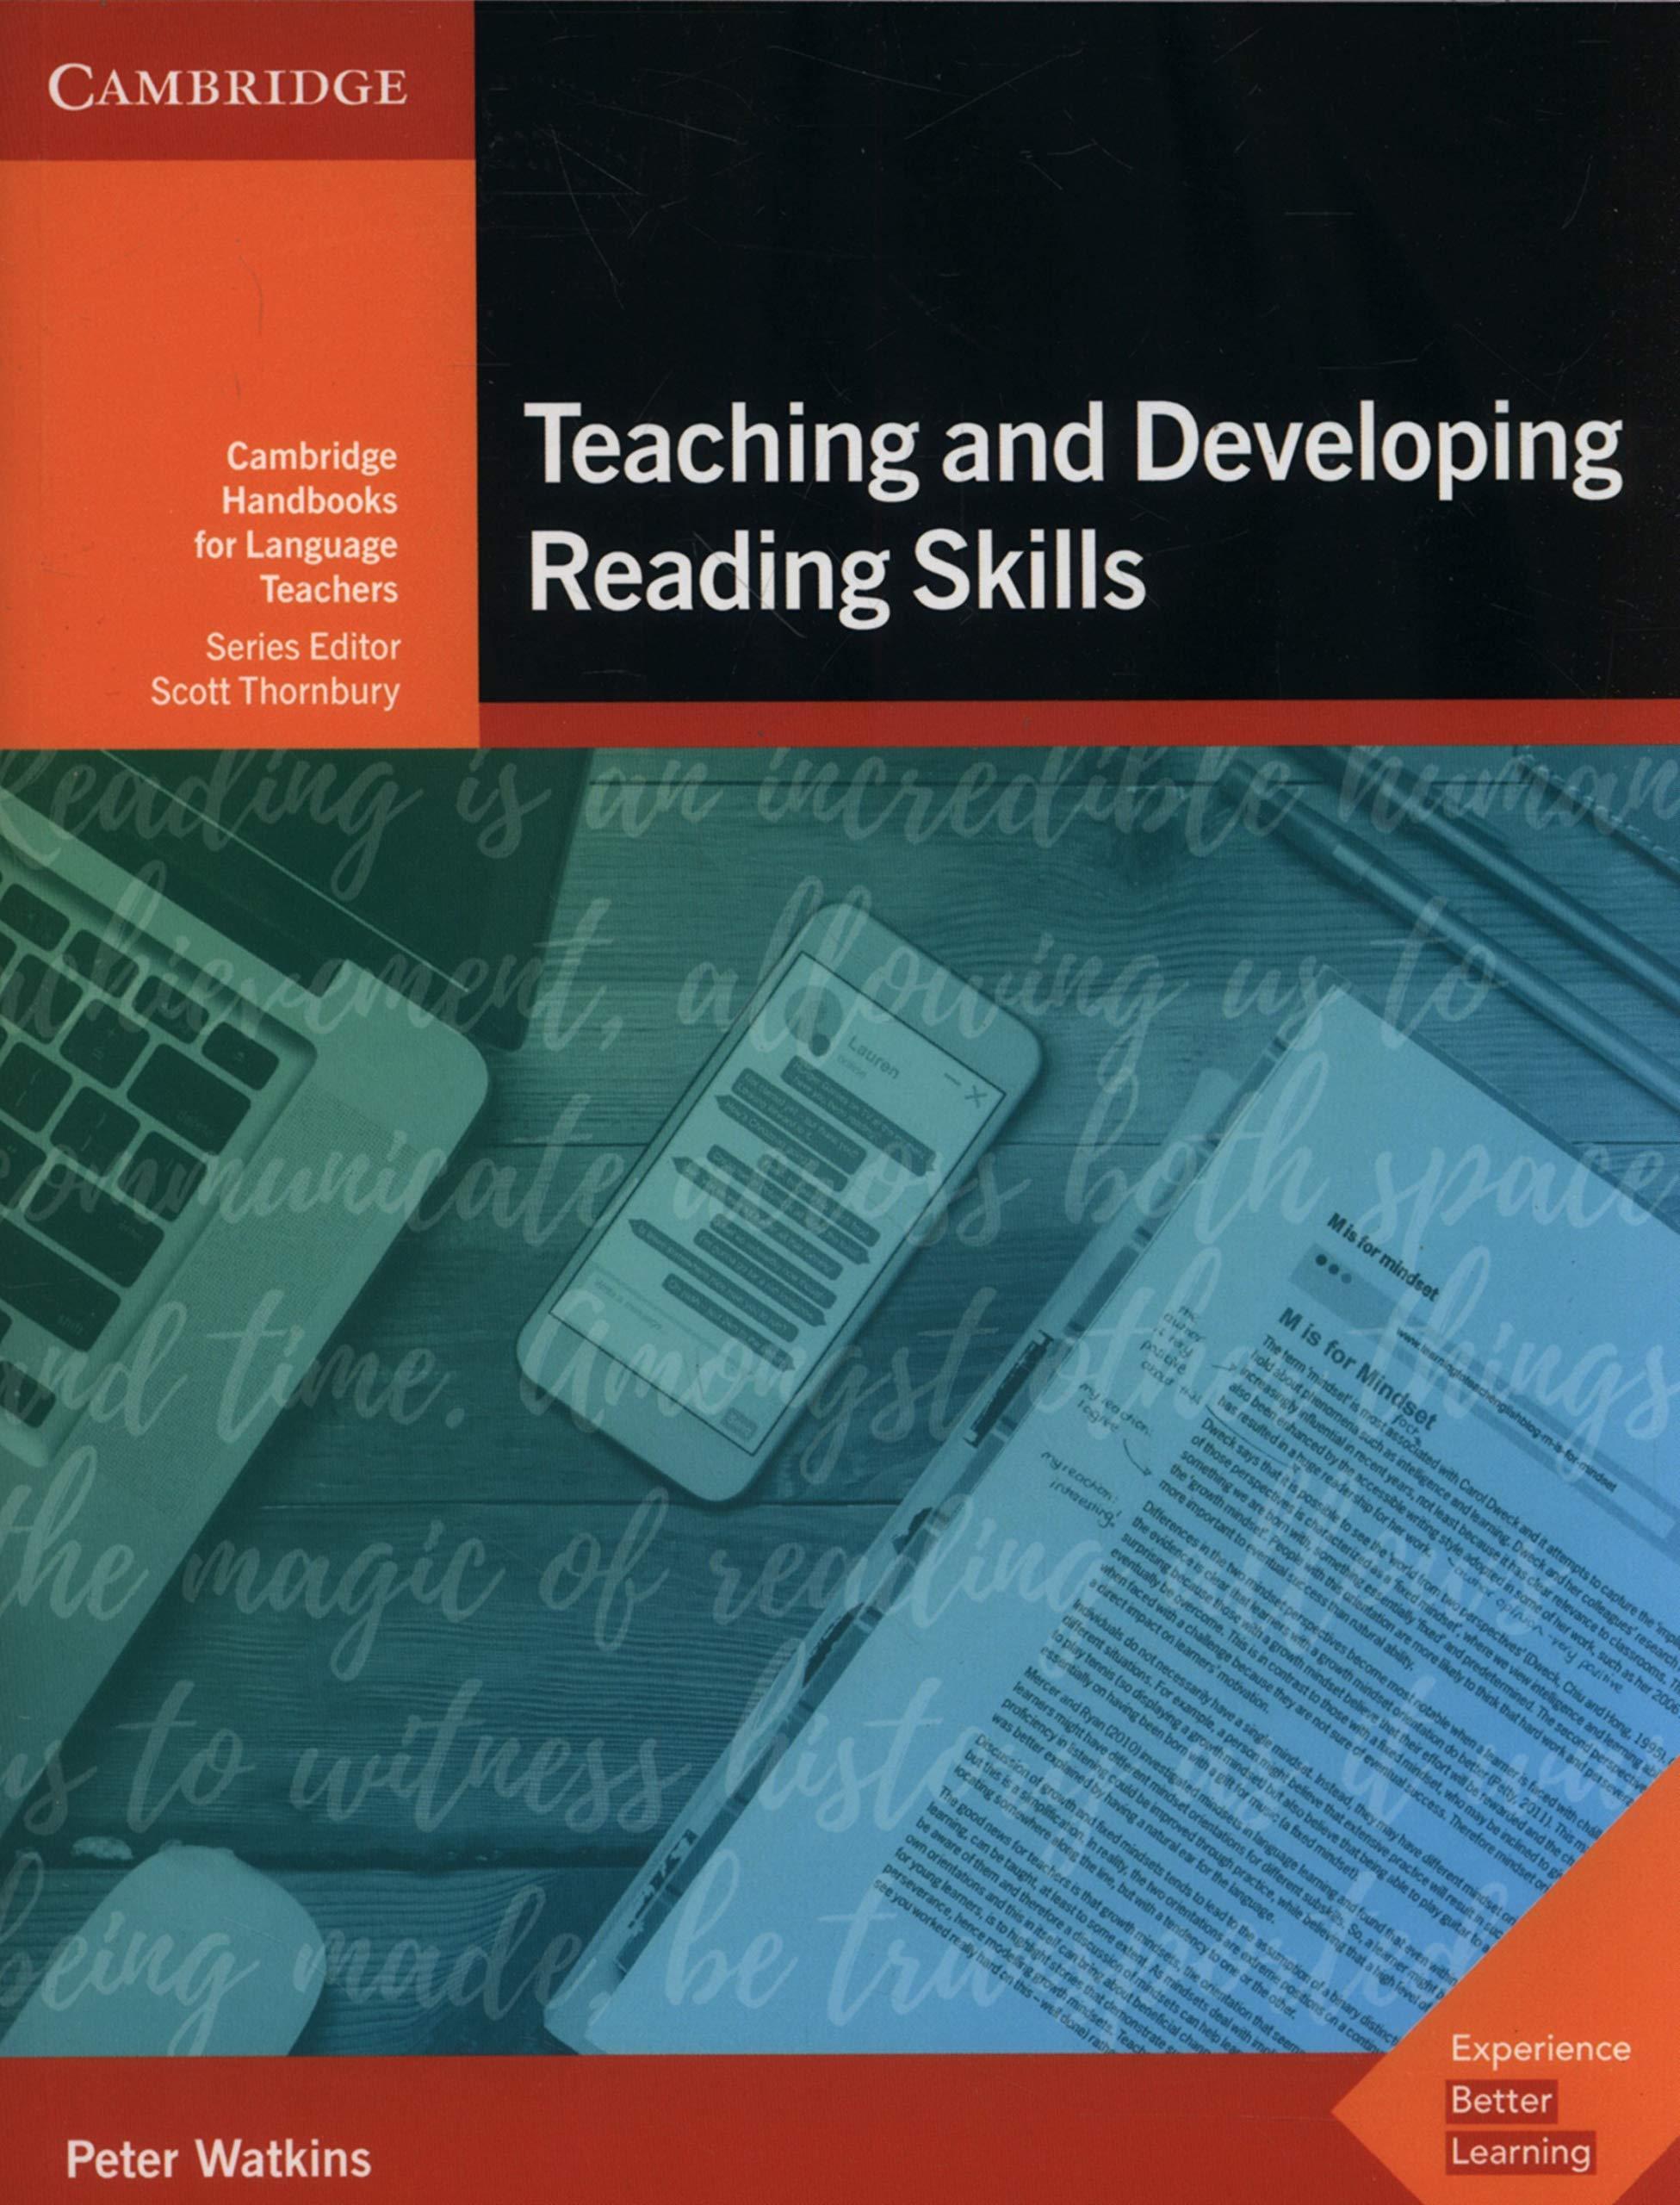 Teaching and Developing Reading Skills: Cambridge Handbooks